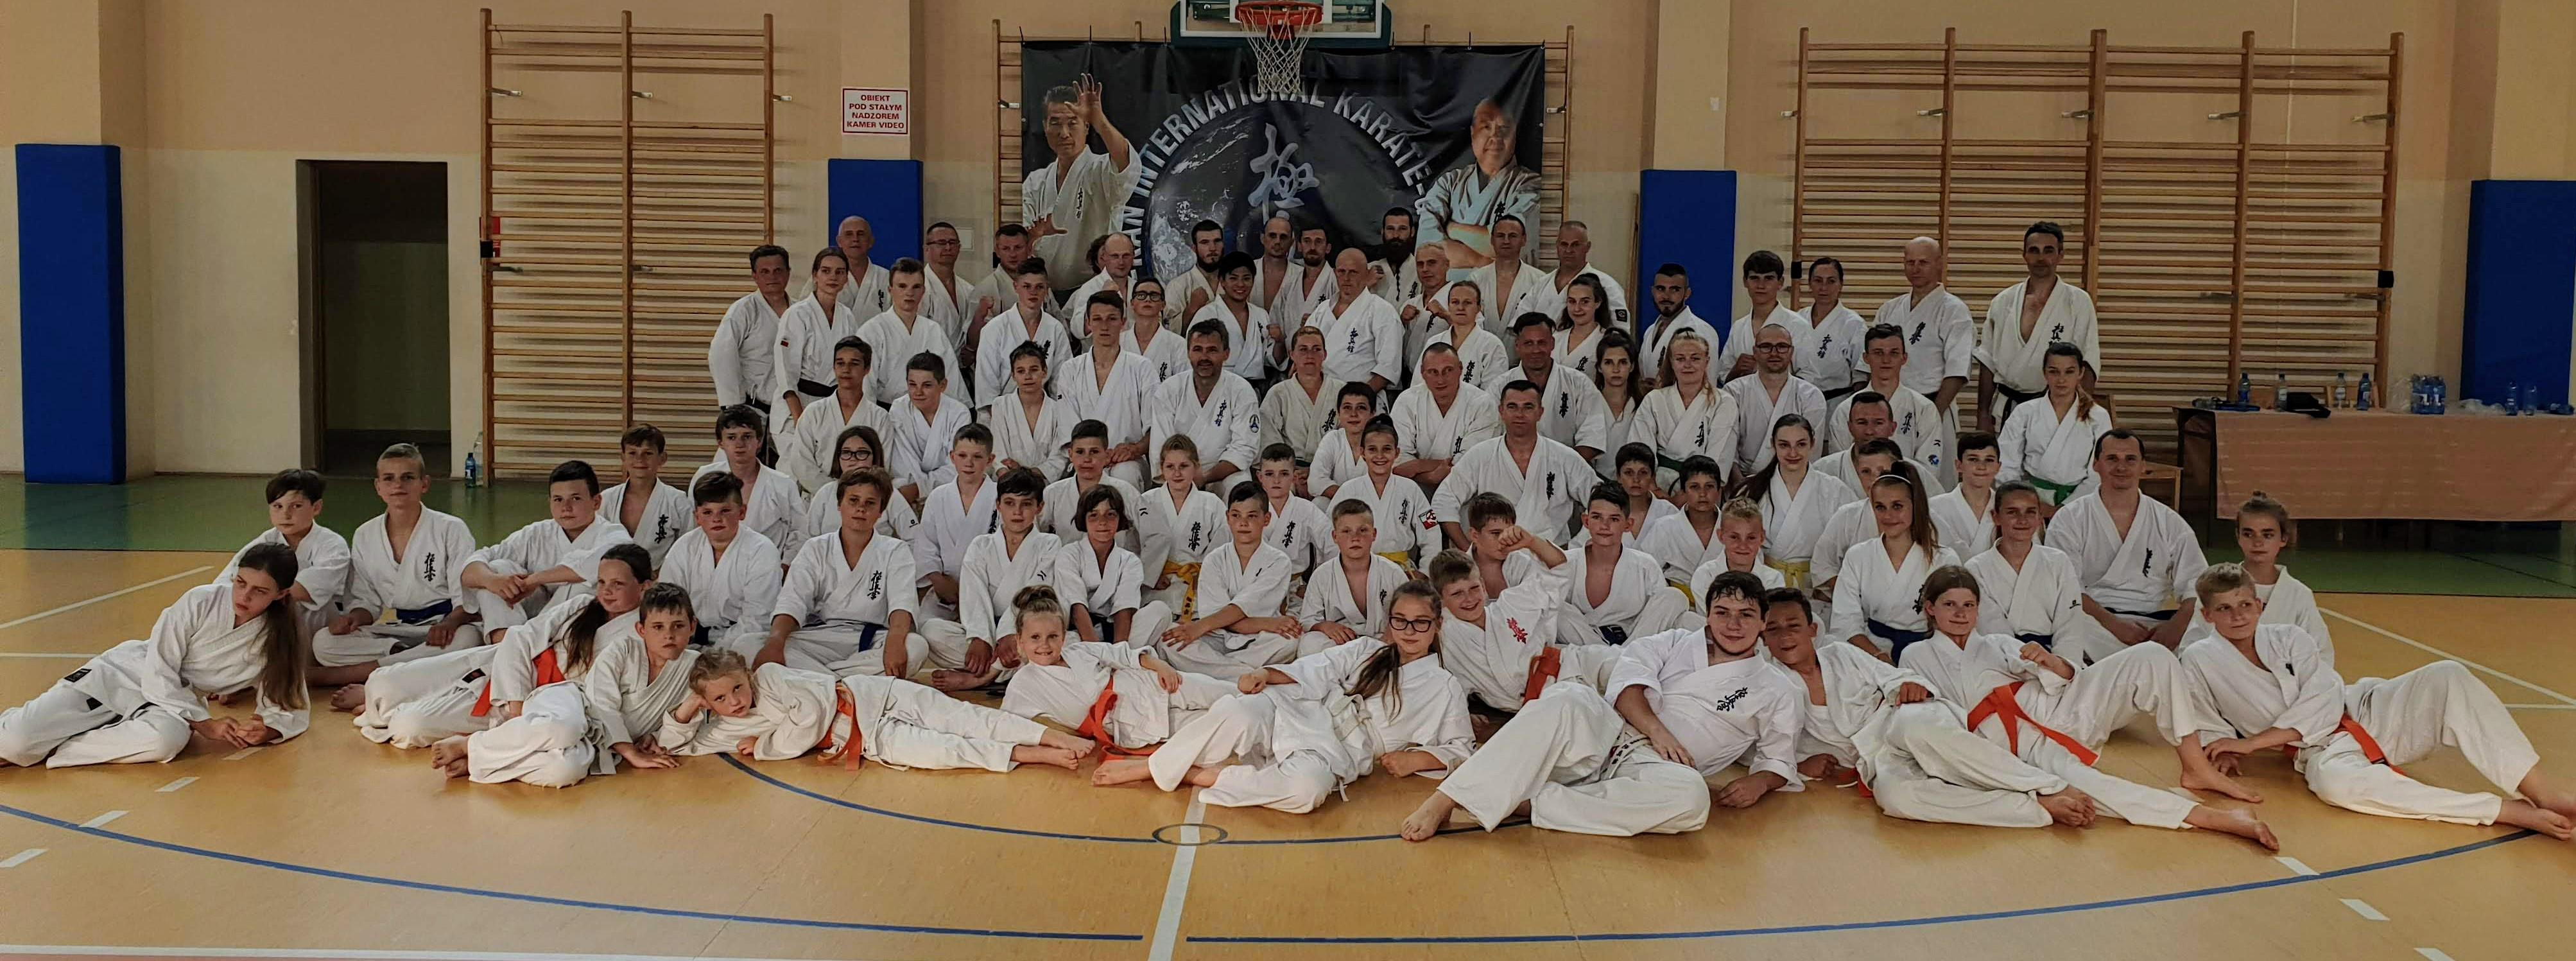 Seminarium Kyokushinkan w Inowrocławiu